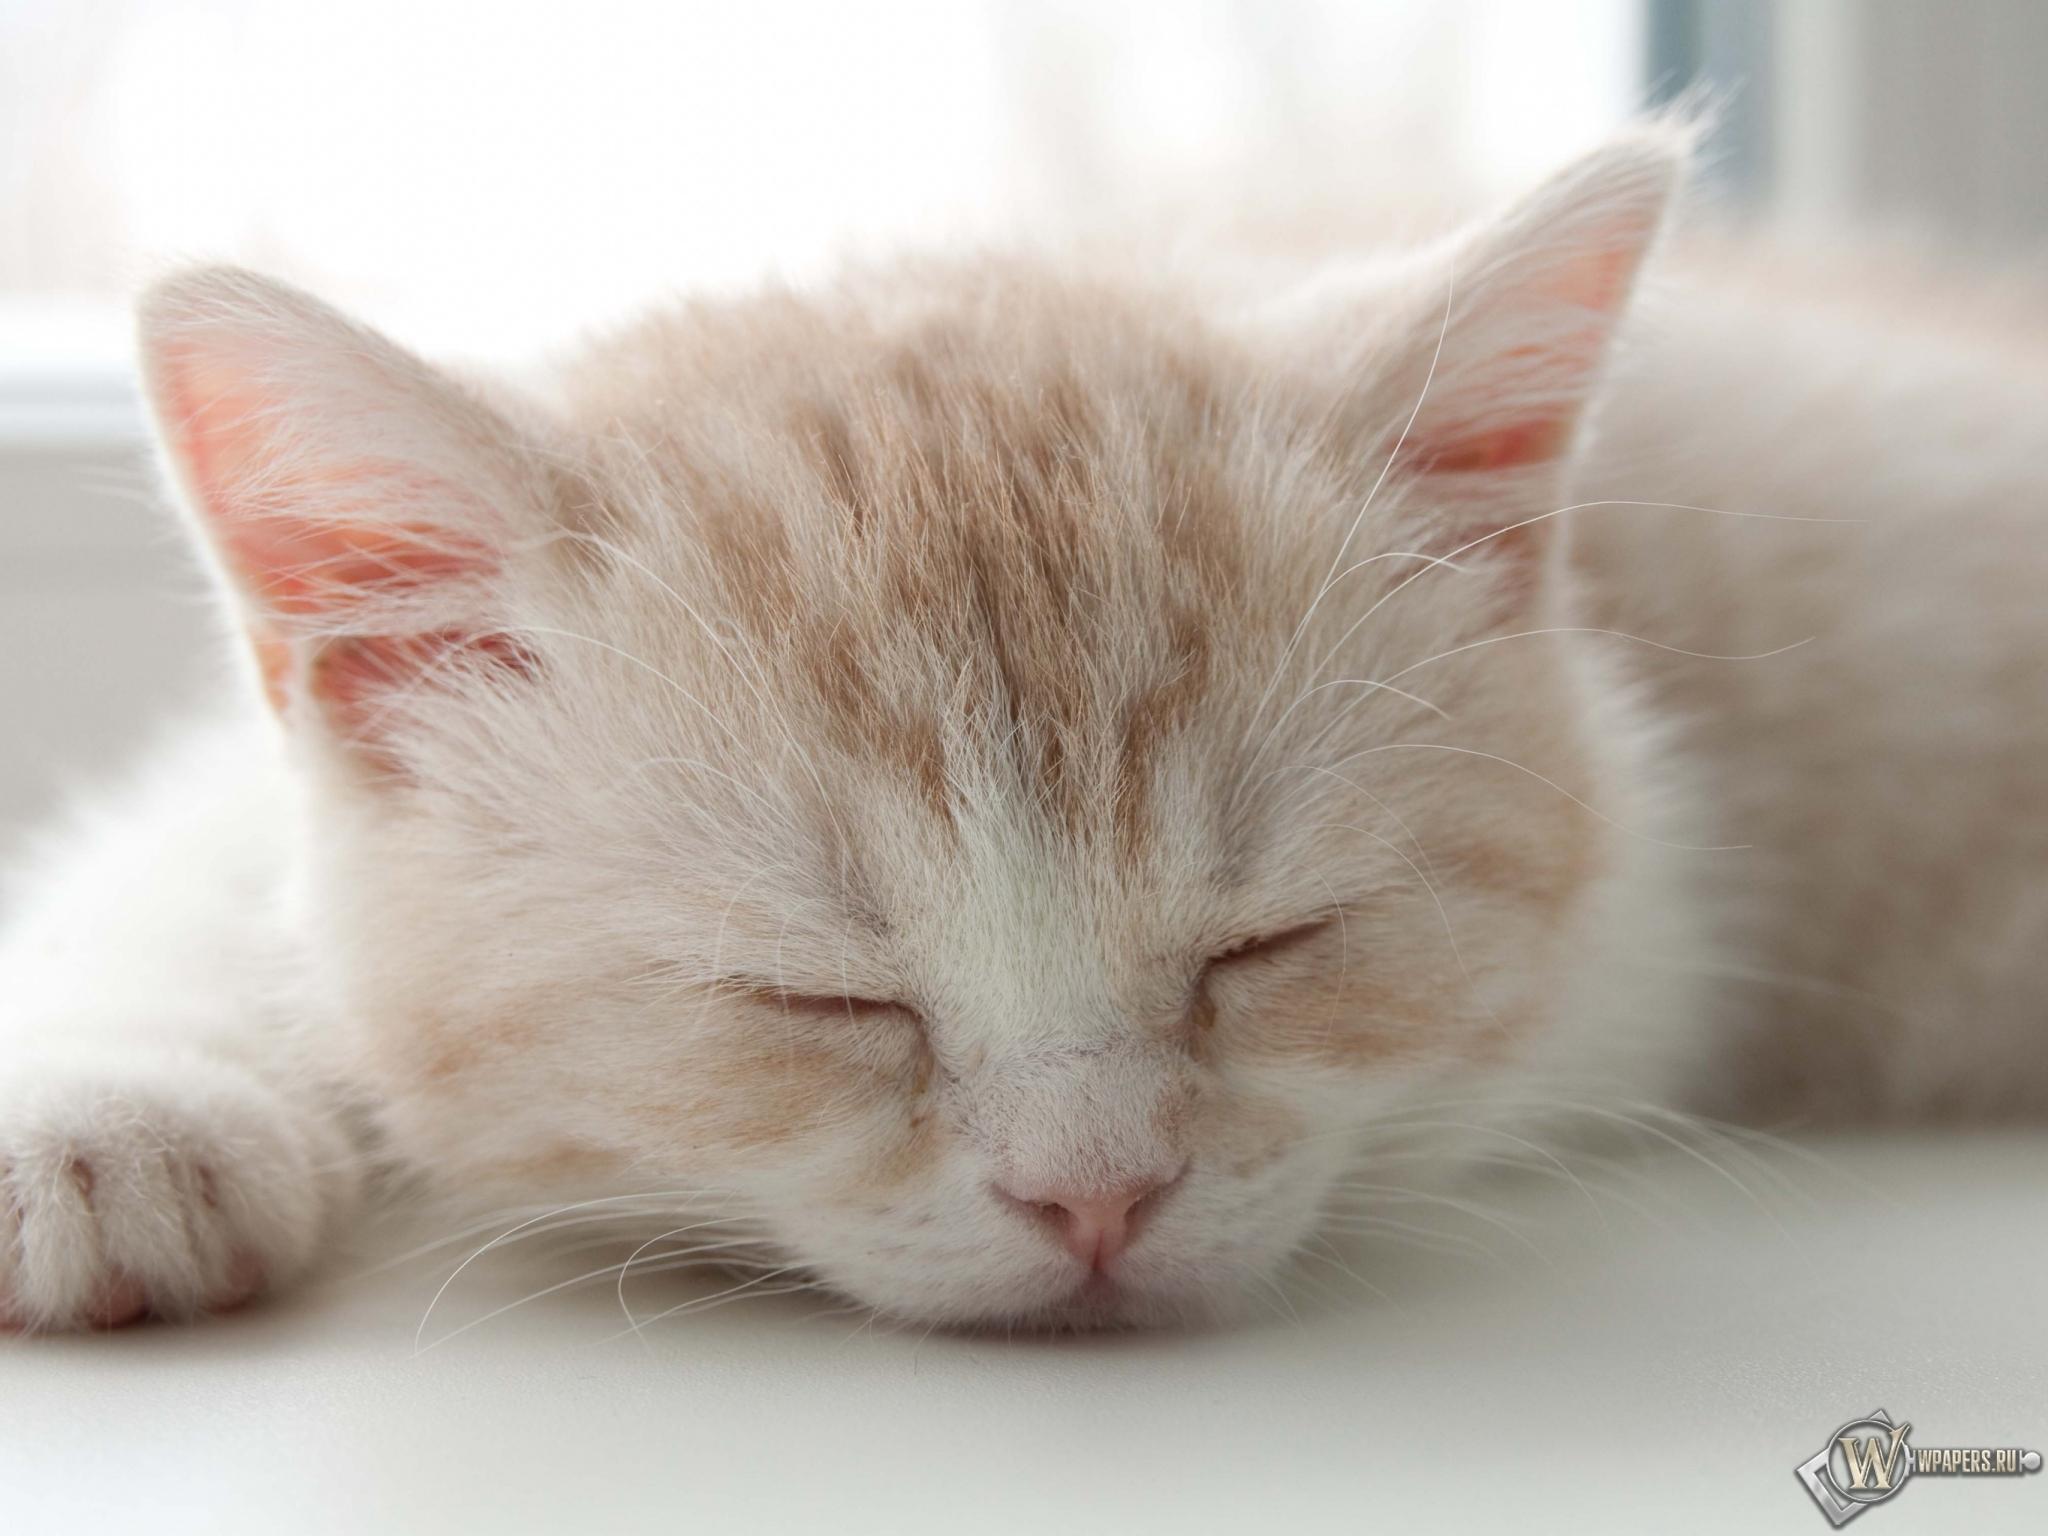 Котёнок спит 2048x1536